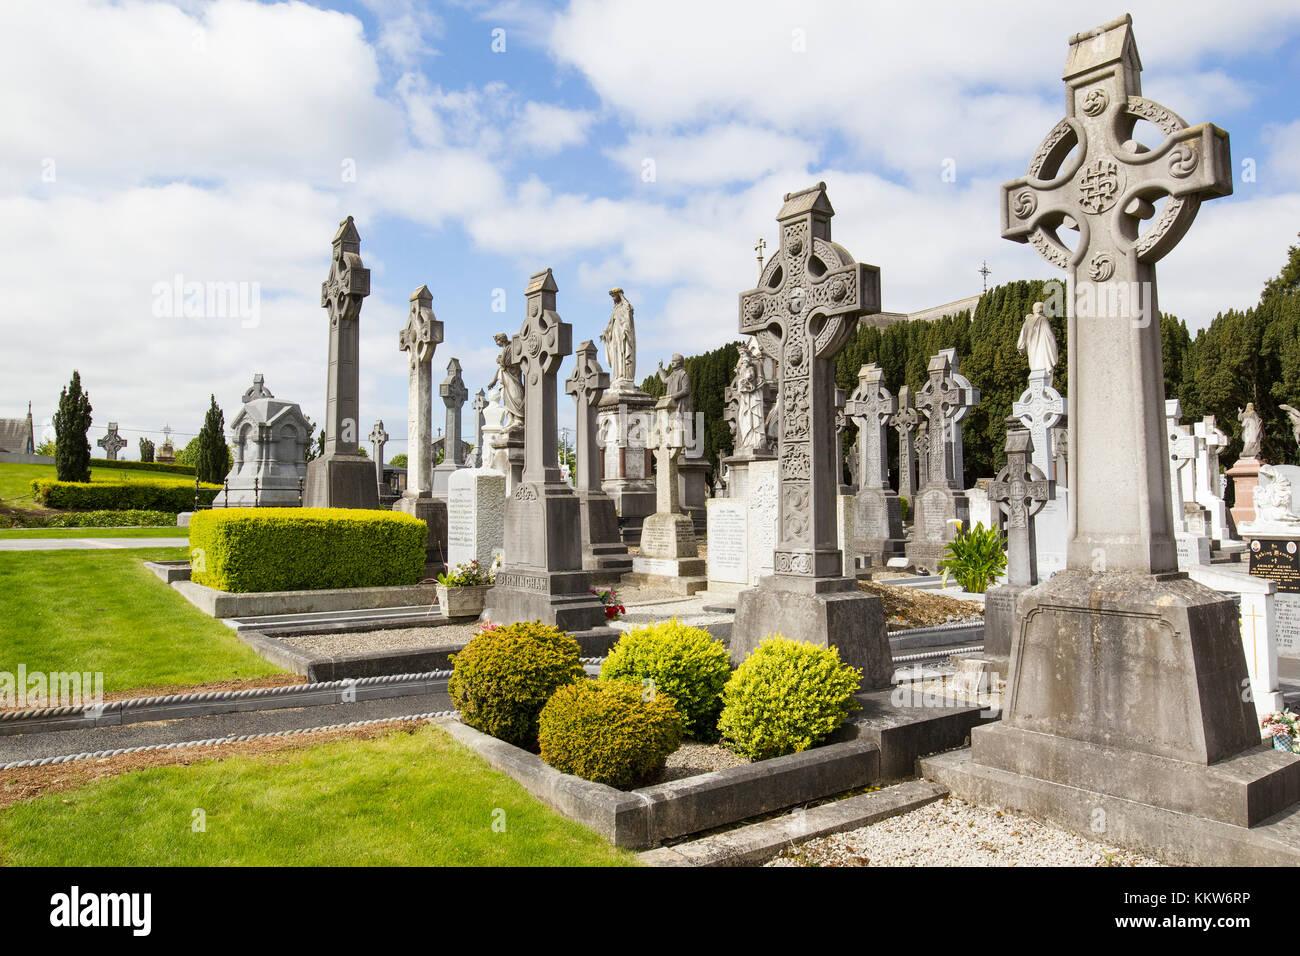 A beautiful Irish cemetery. ----- Ireland, Dublin - May 22, 2015: photograph of the cemetery in Dublin on a beautiful Stock Photo